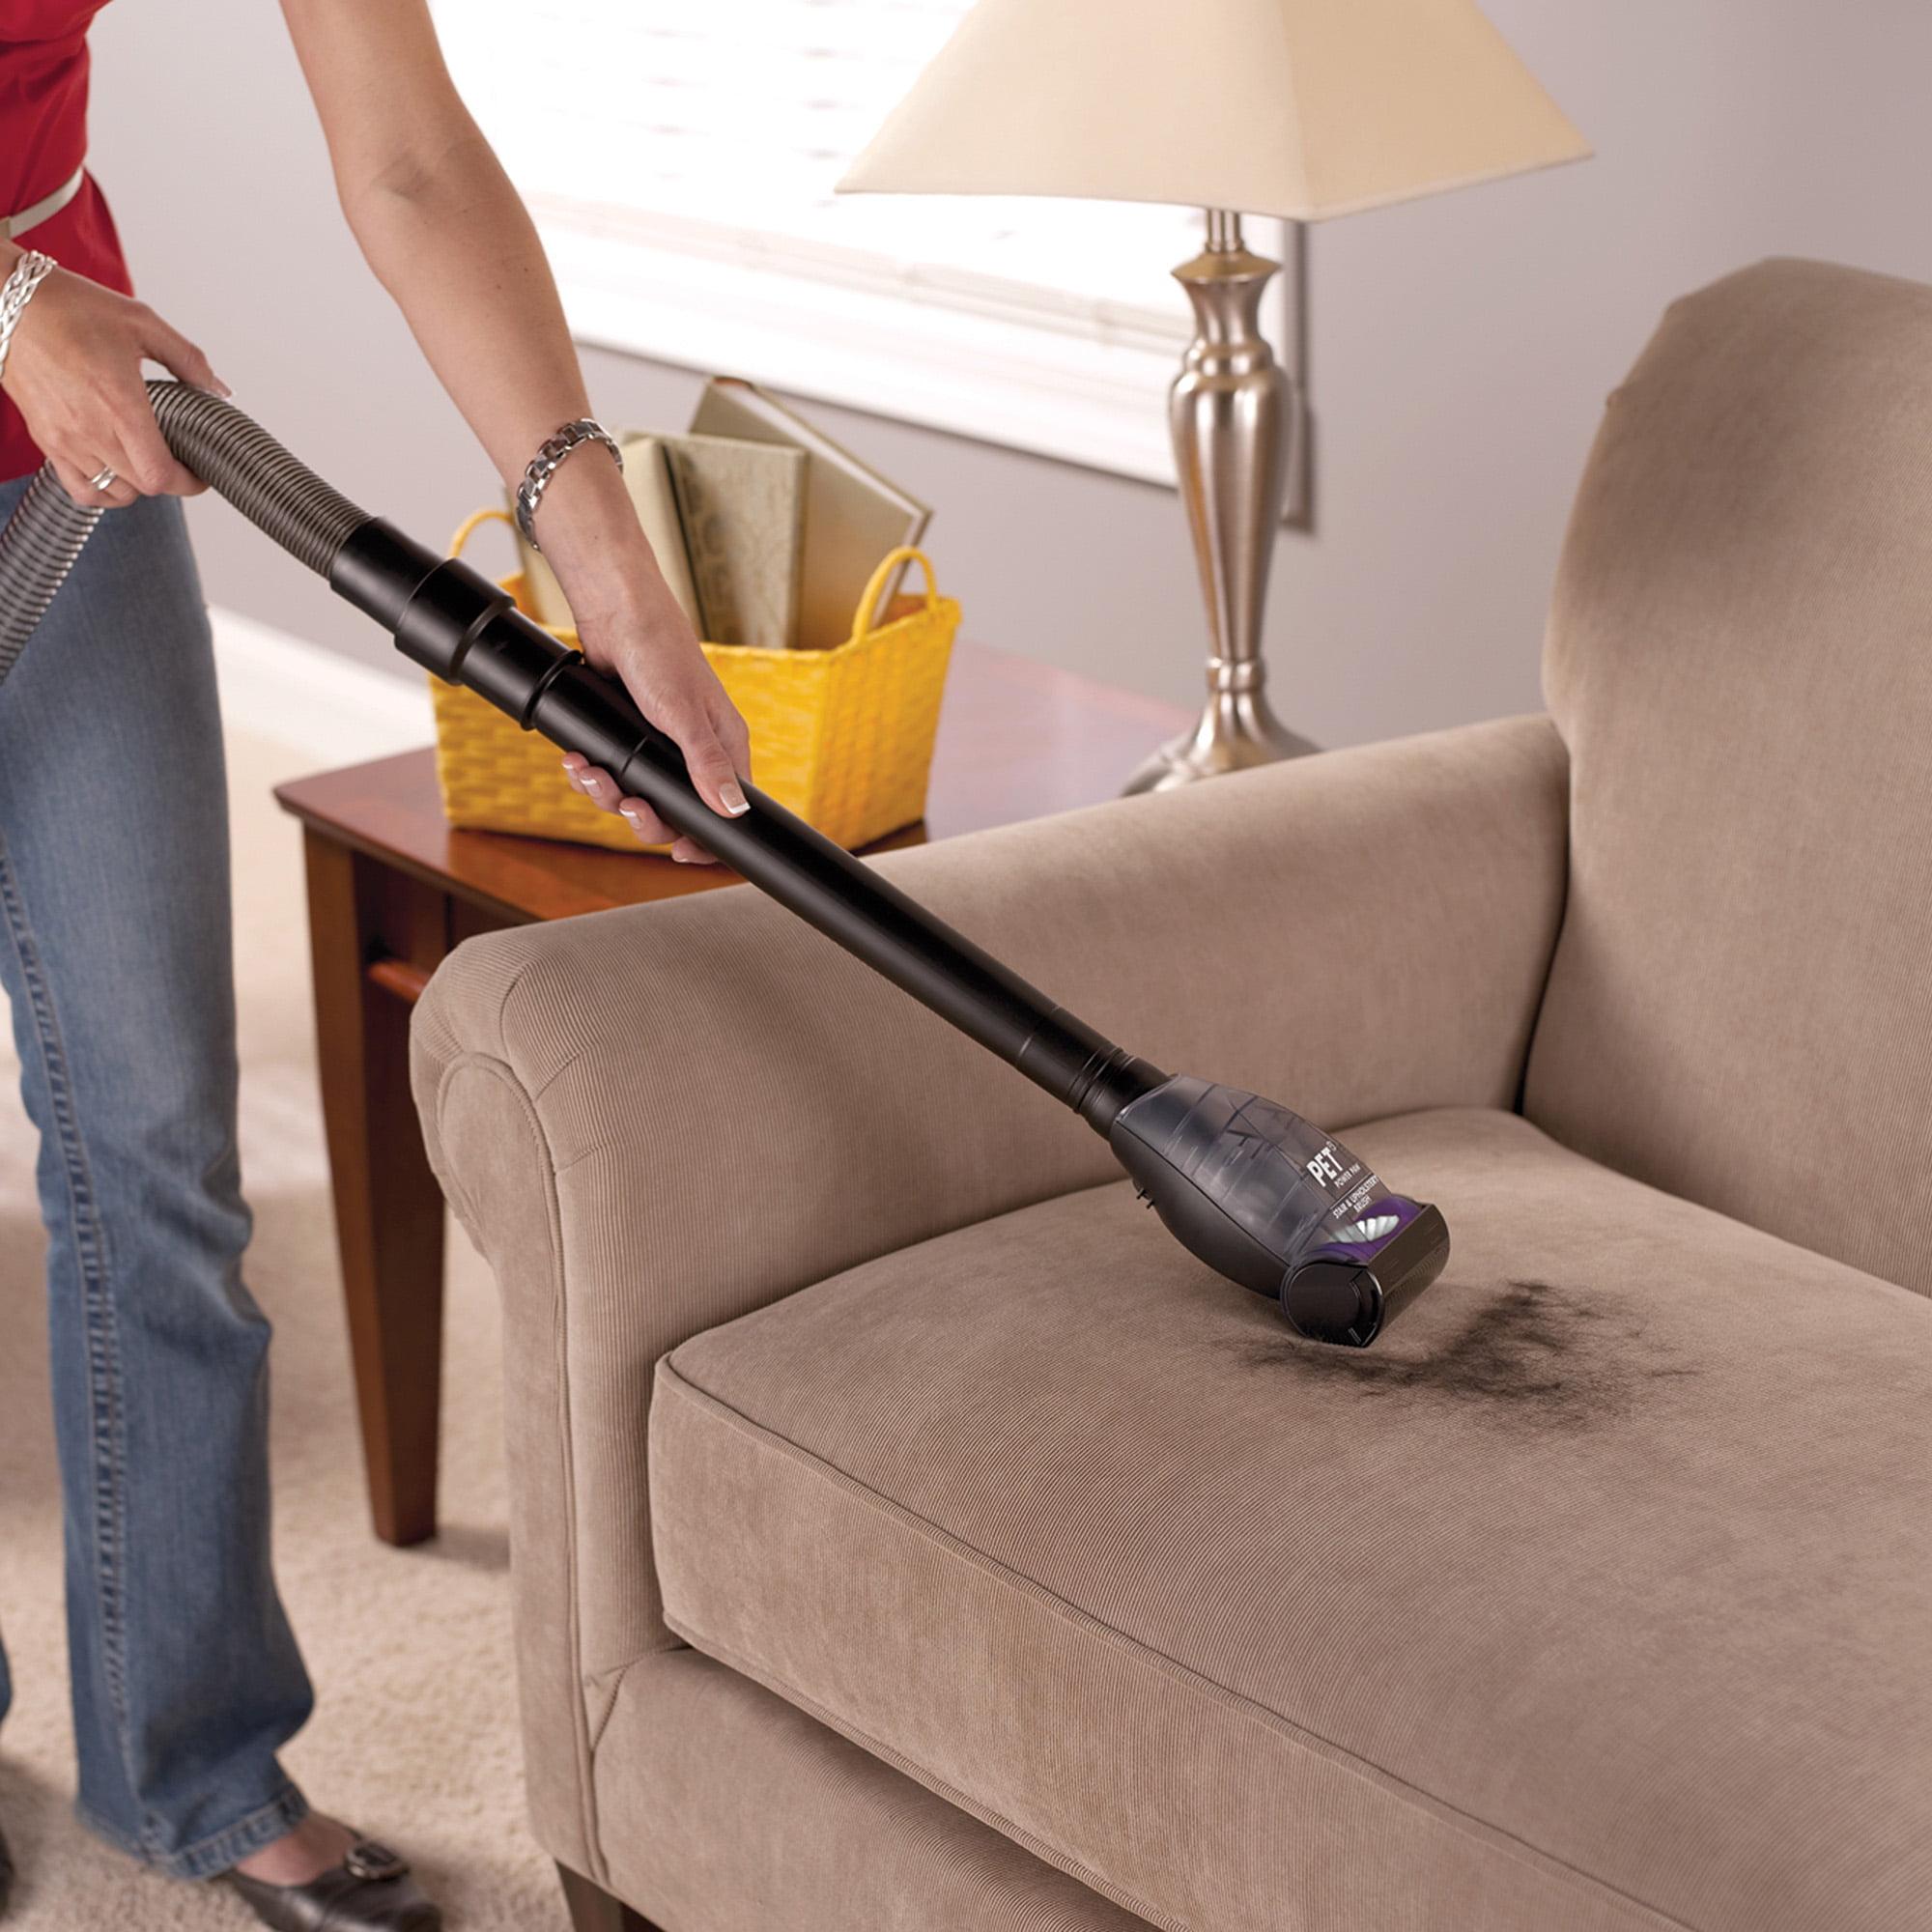 Eureka AirSpeed Pro All Floors Rewind Pet Bagless Upright Vacuum, AS1061A    Walmart.com